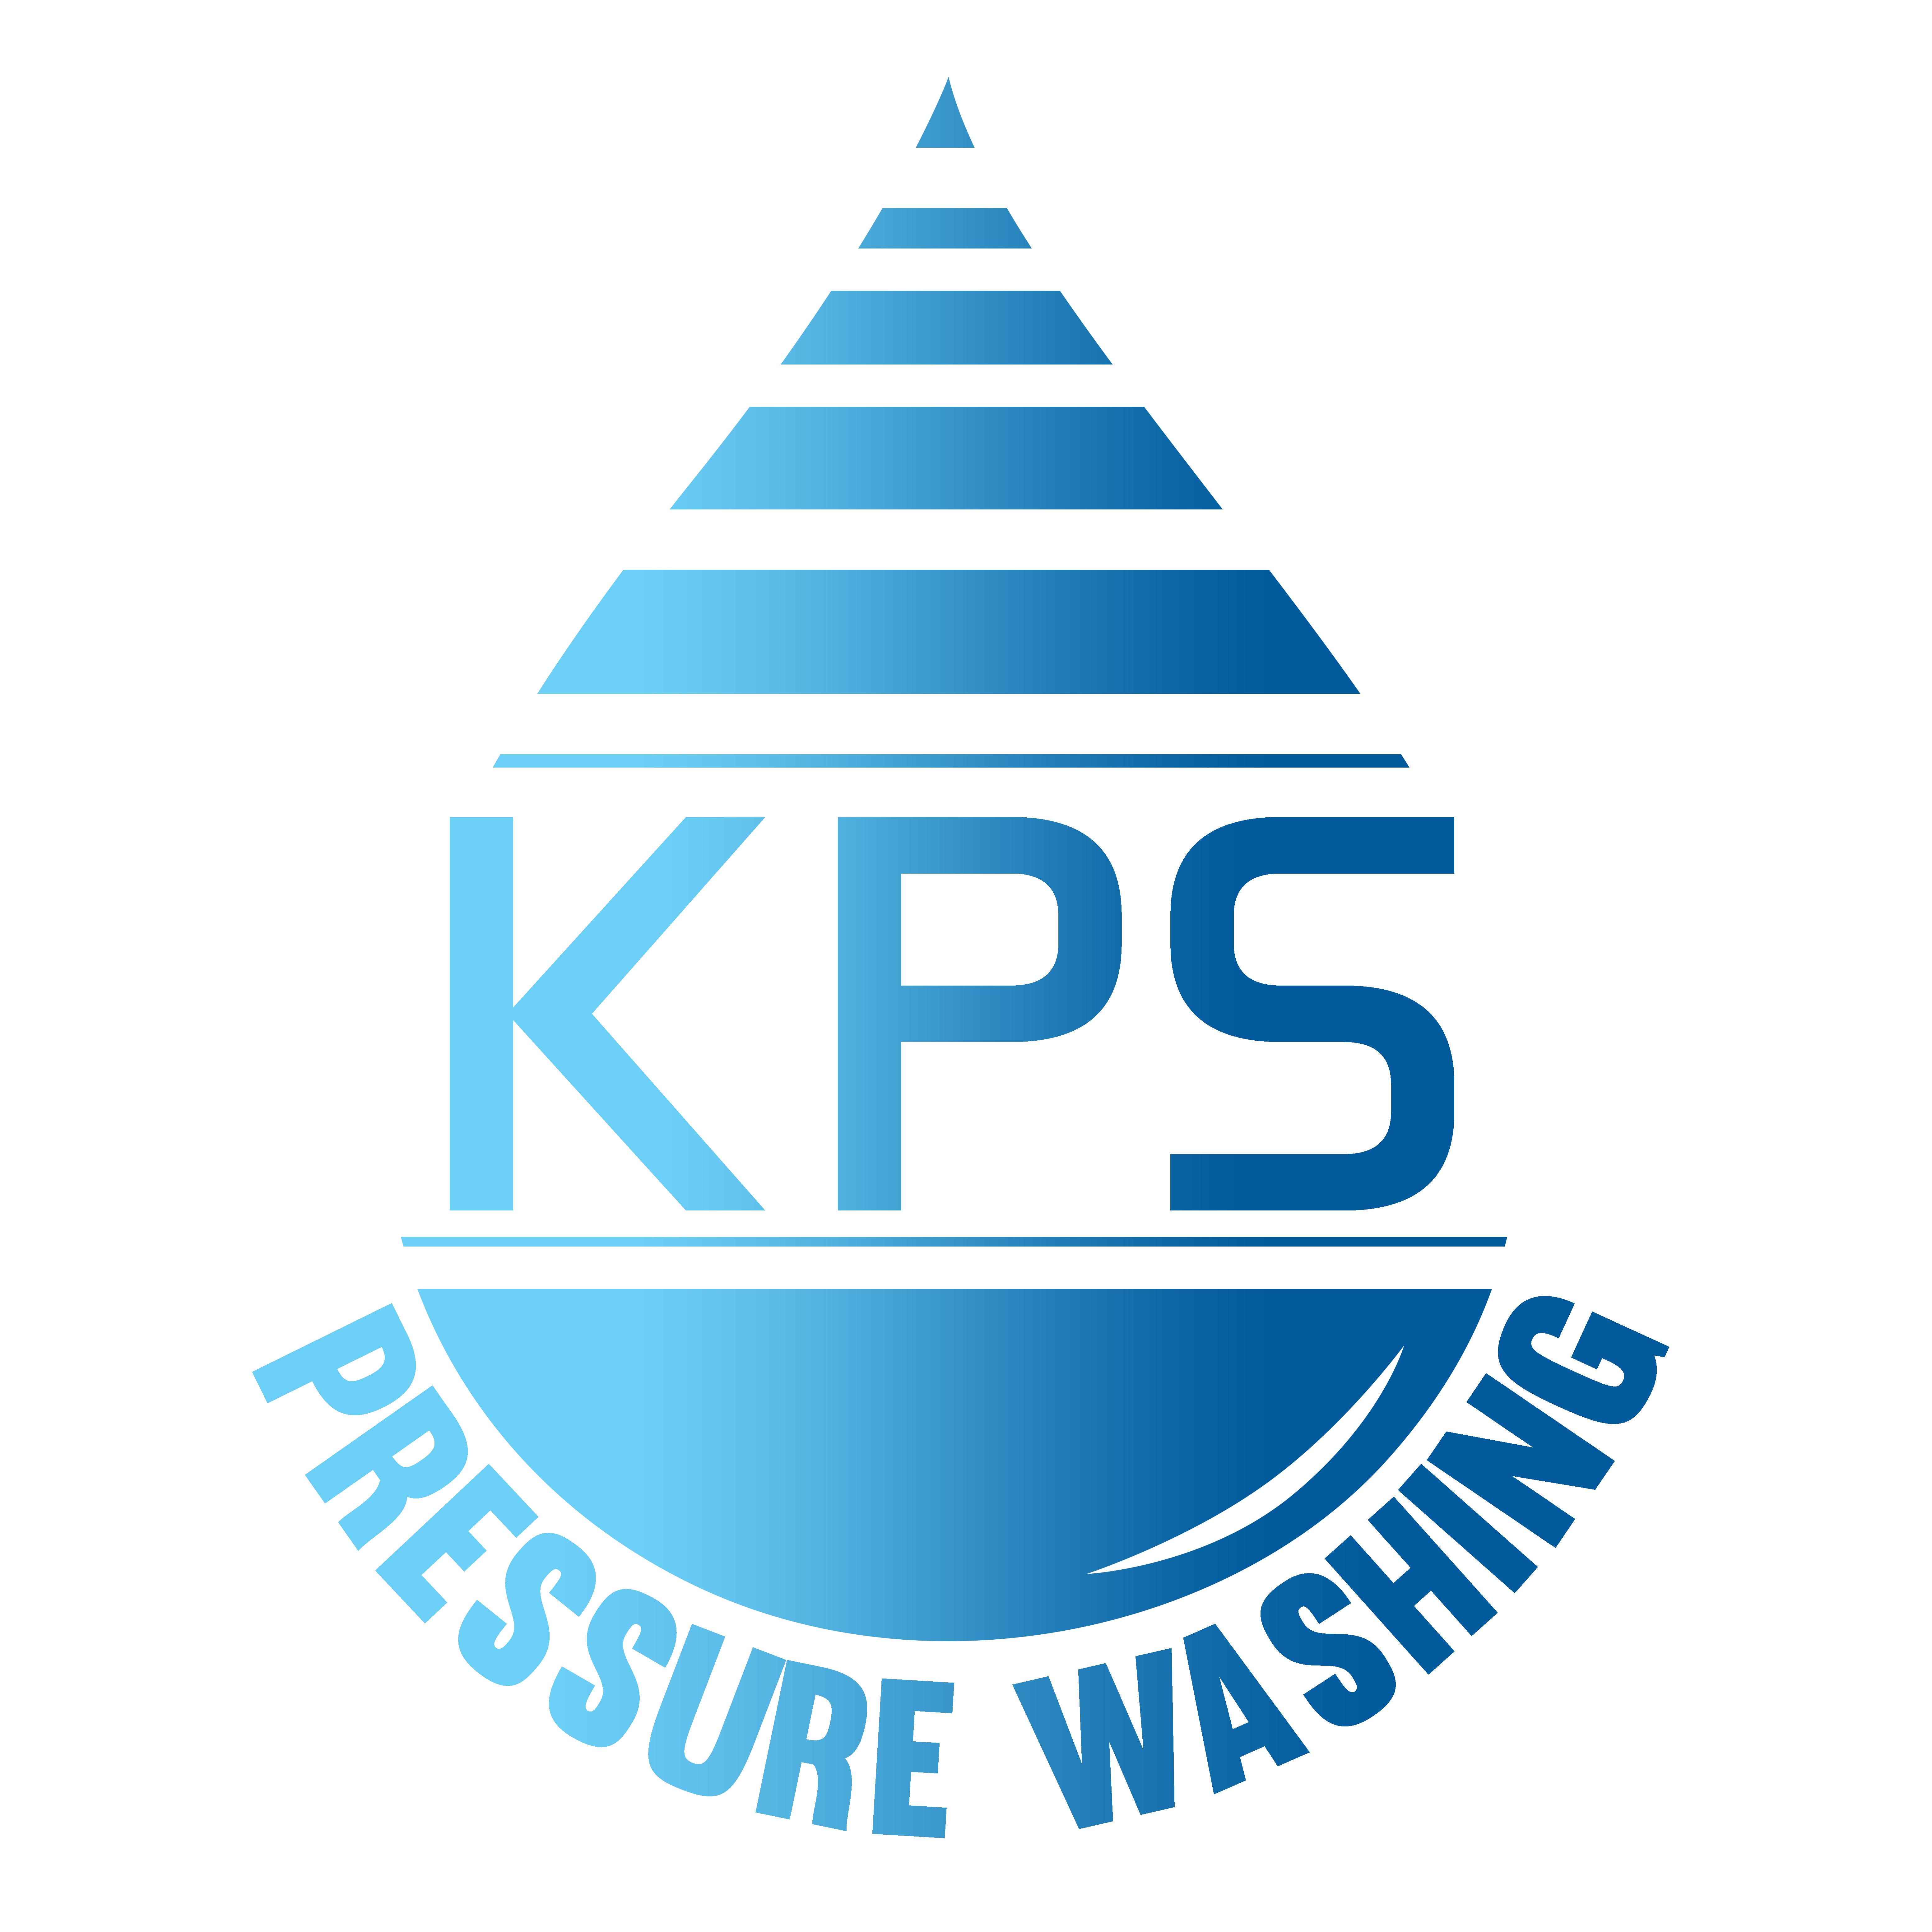 Kps Pressure Washing, Llc